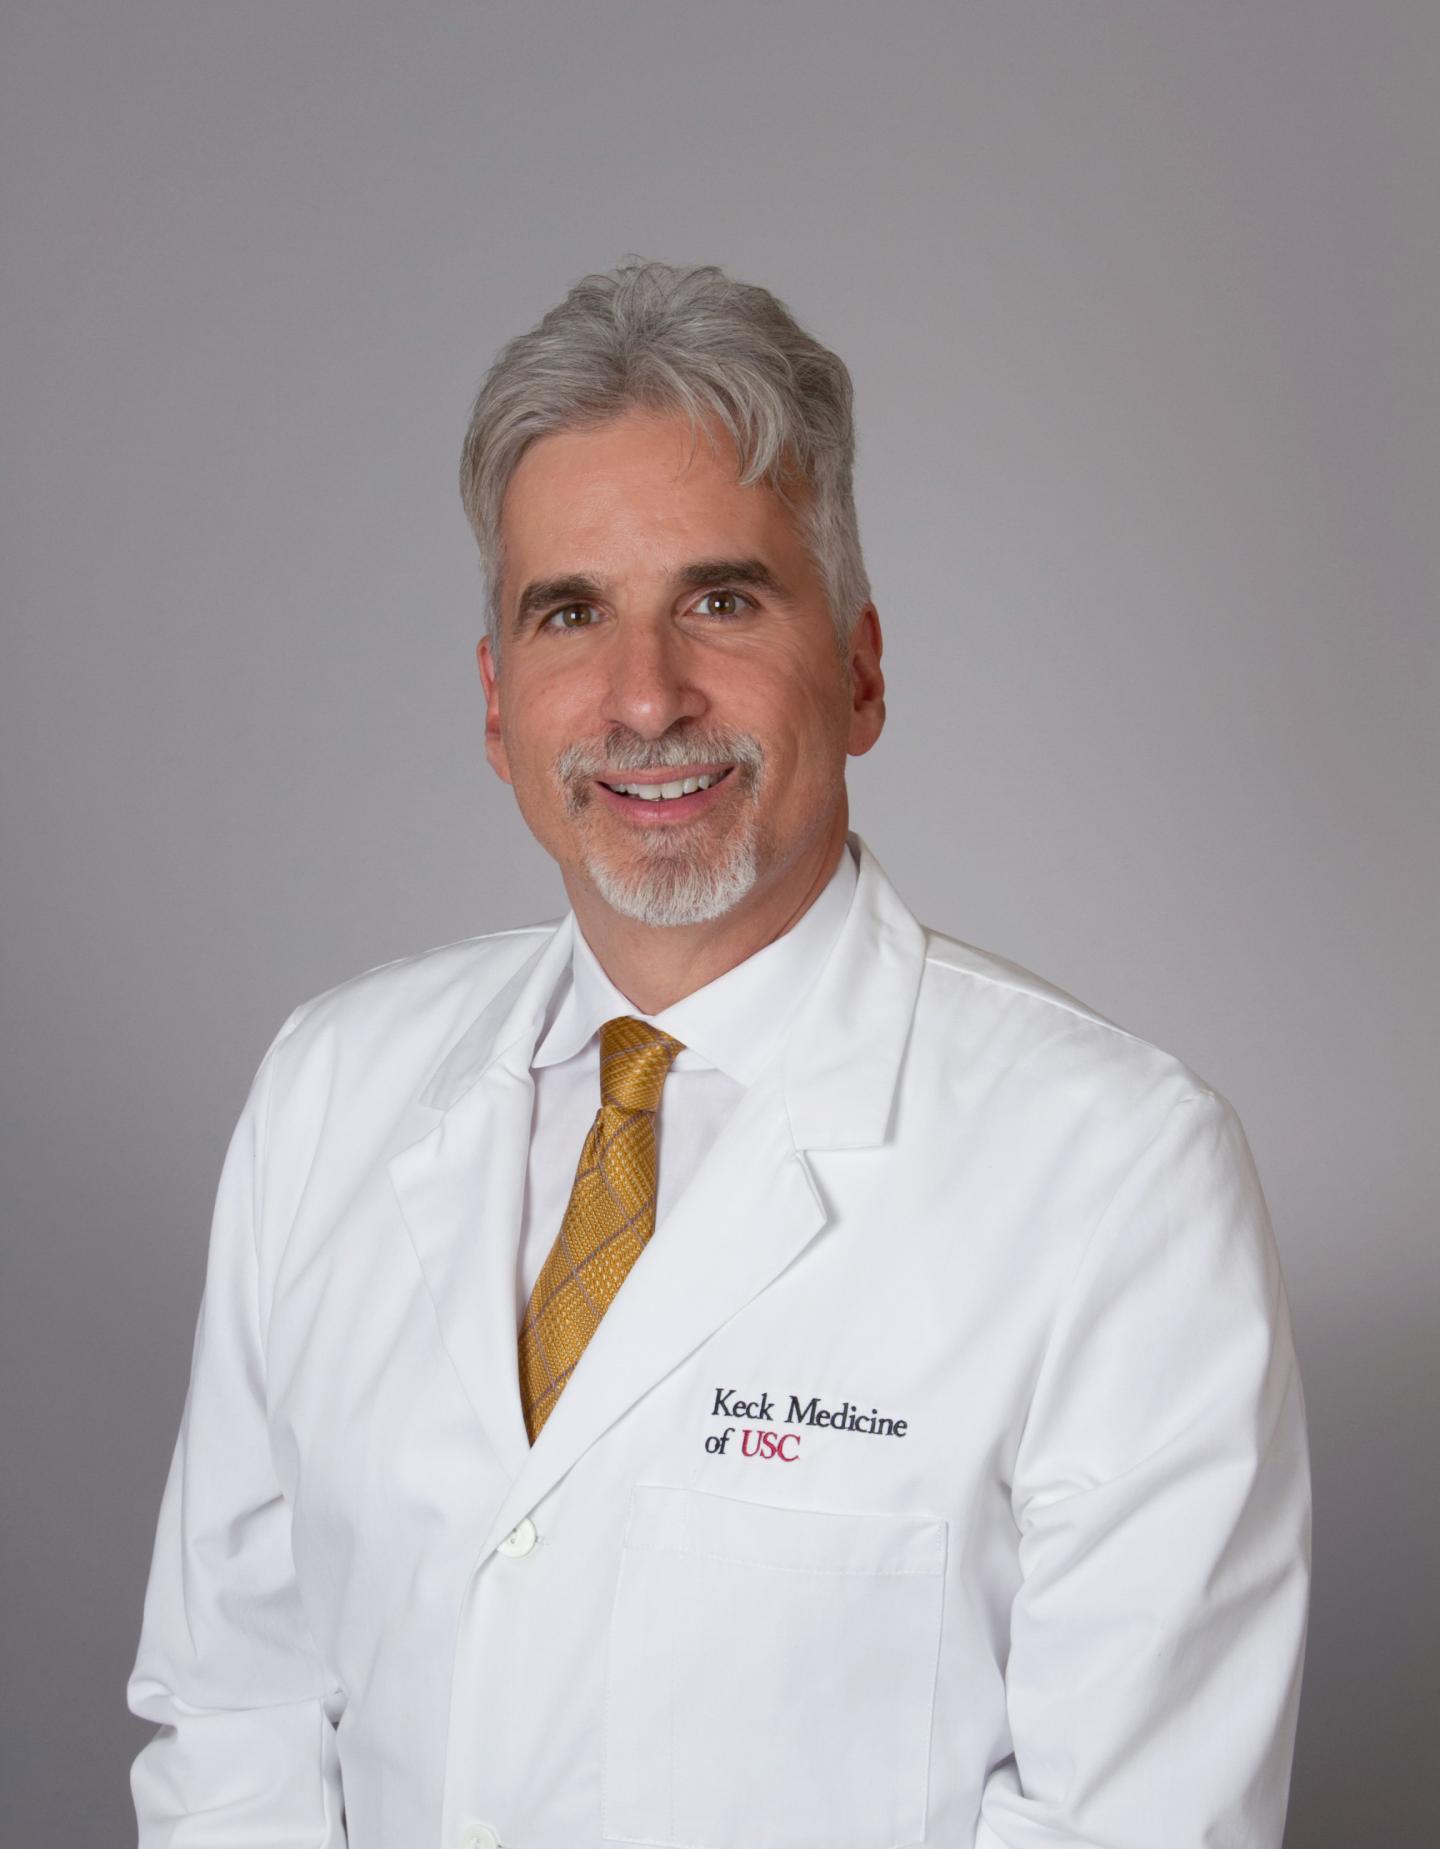 Hugo Rosen, M.D., University of Southern California - Health Sciences